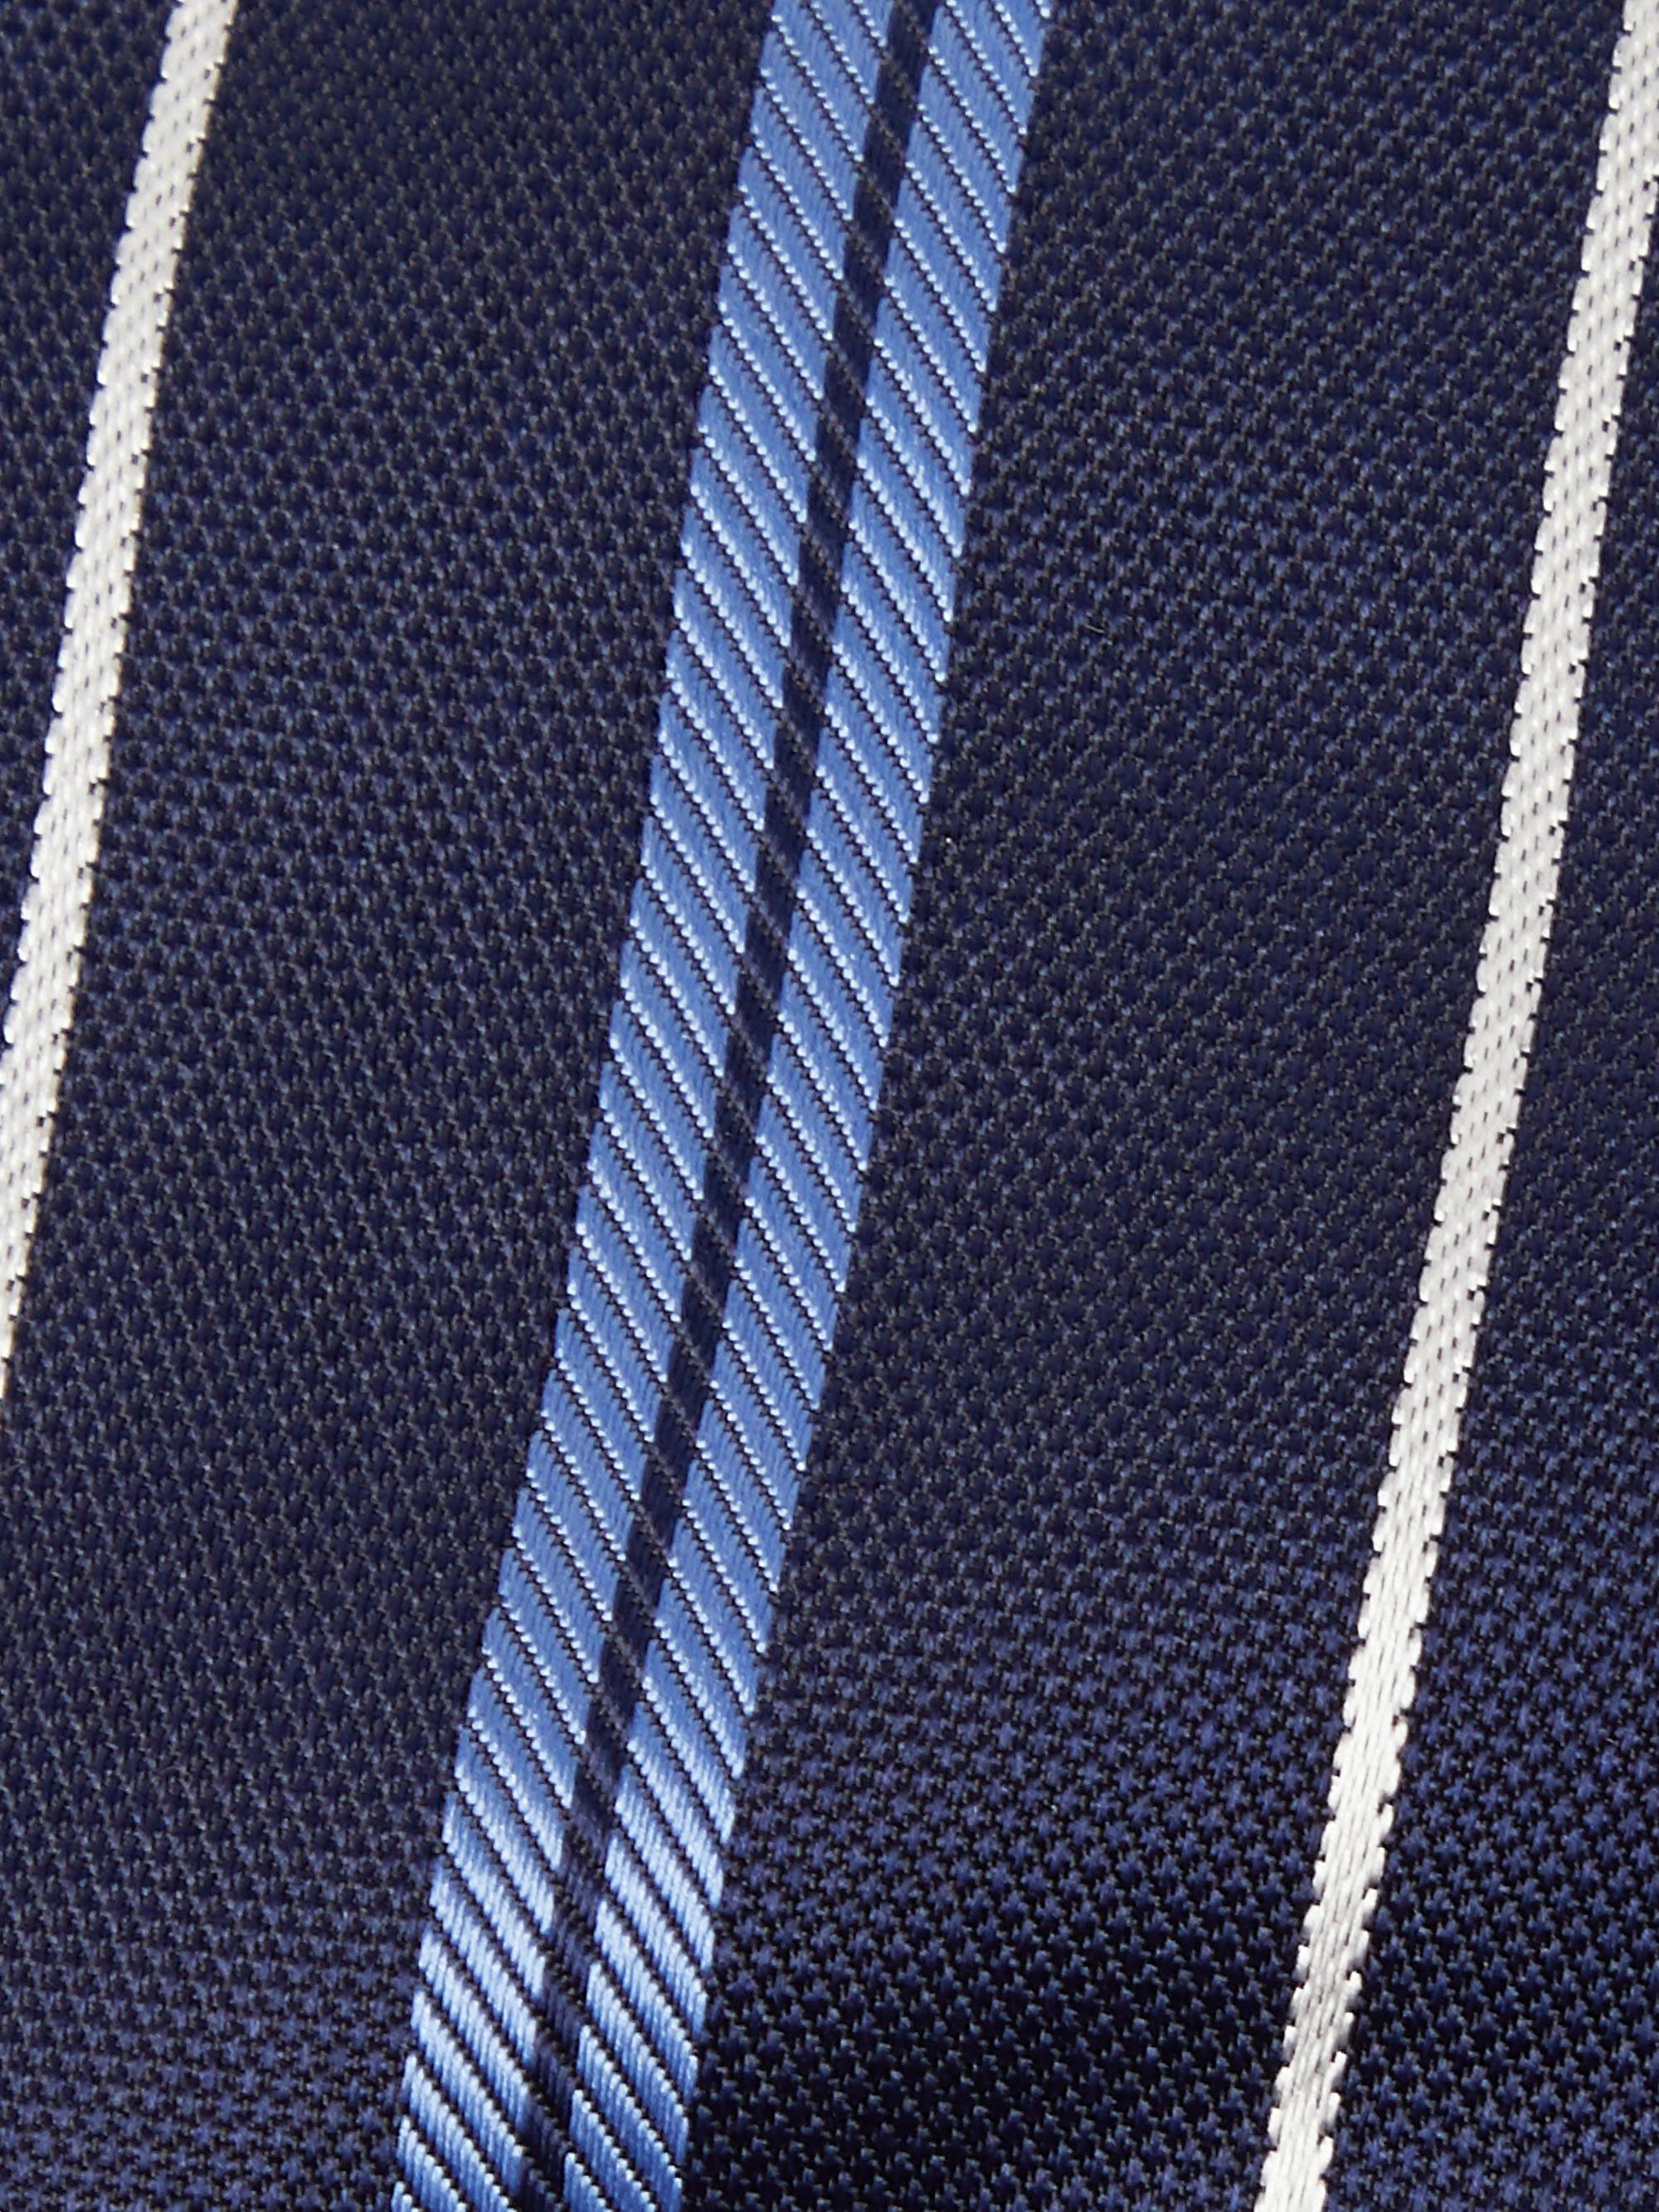 Hugo Boss Navy White Striped Knitted Tie